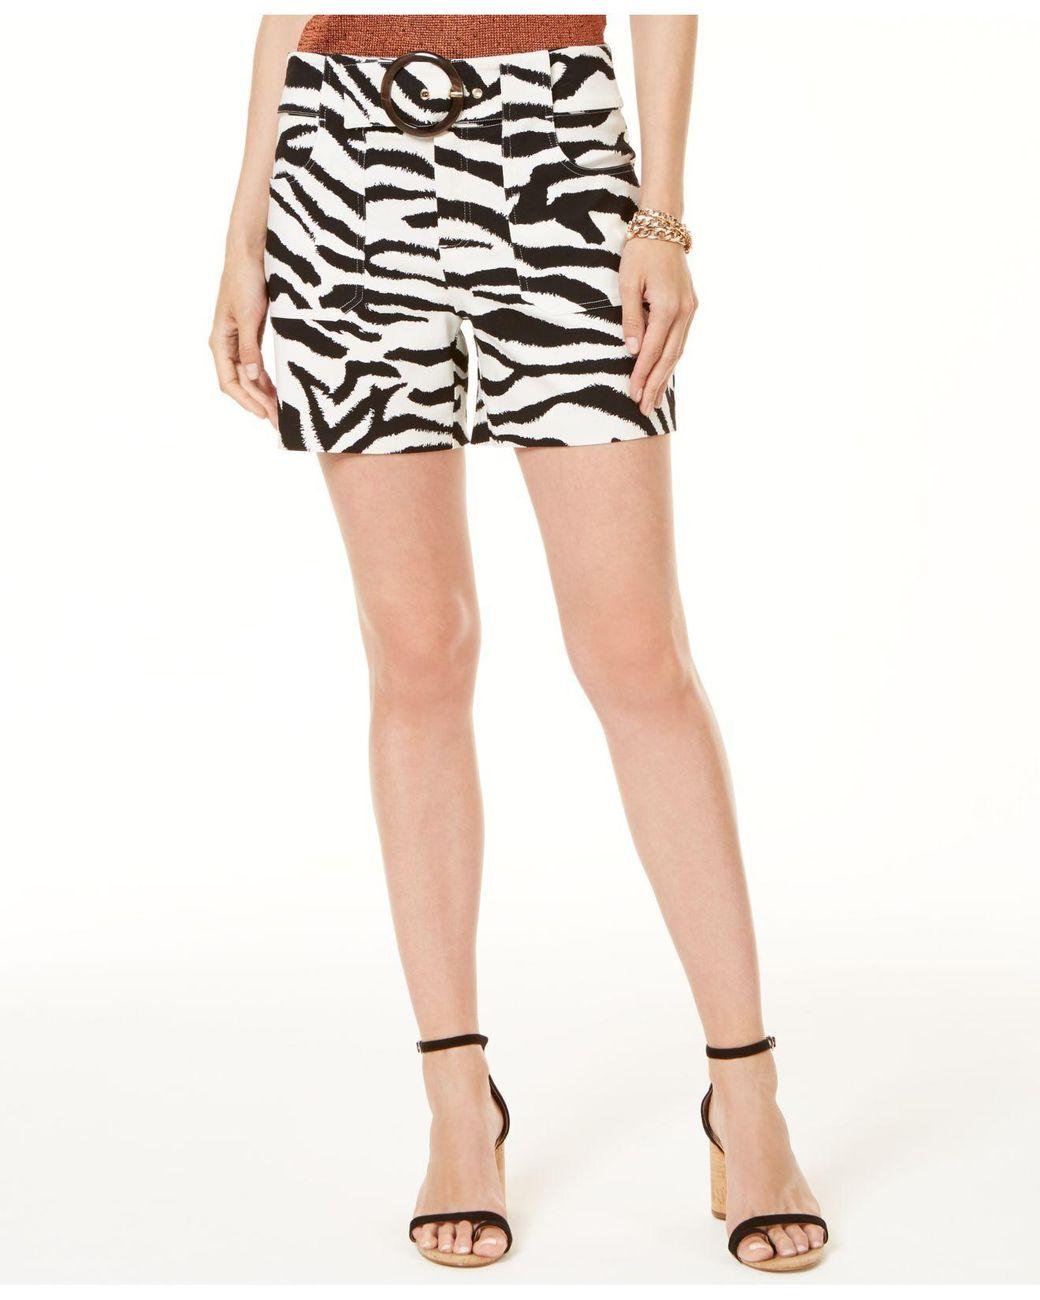 Shorts adidas Originals Zebra Women/'s Short Sports Embroidered Details